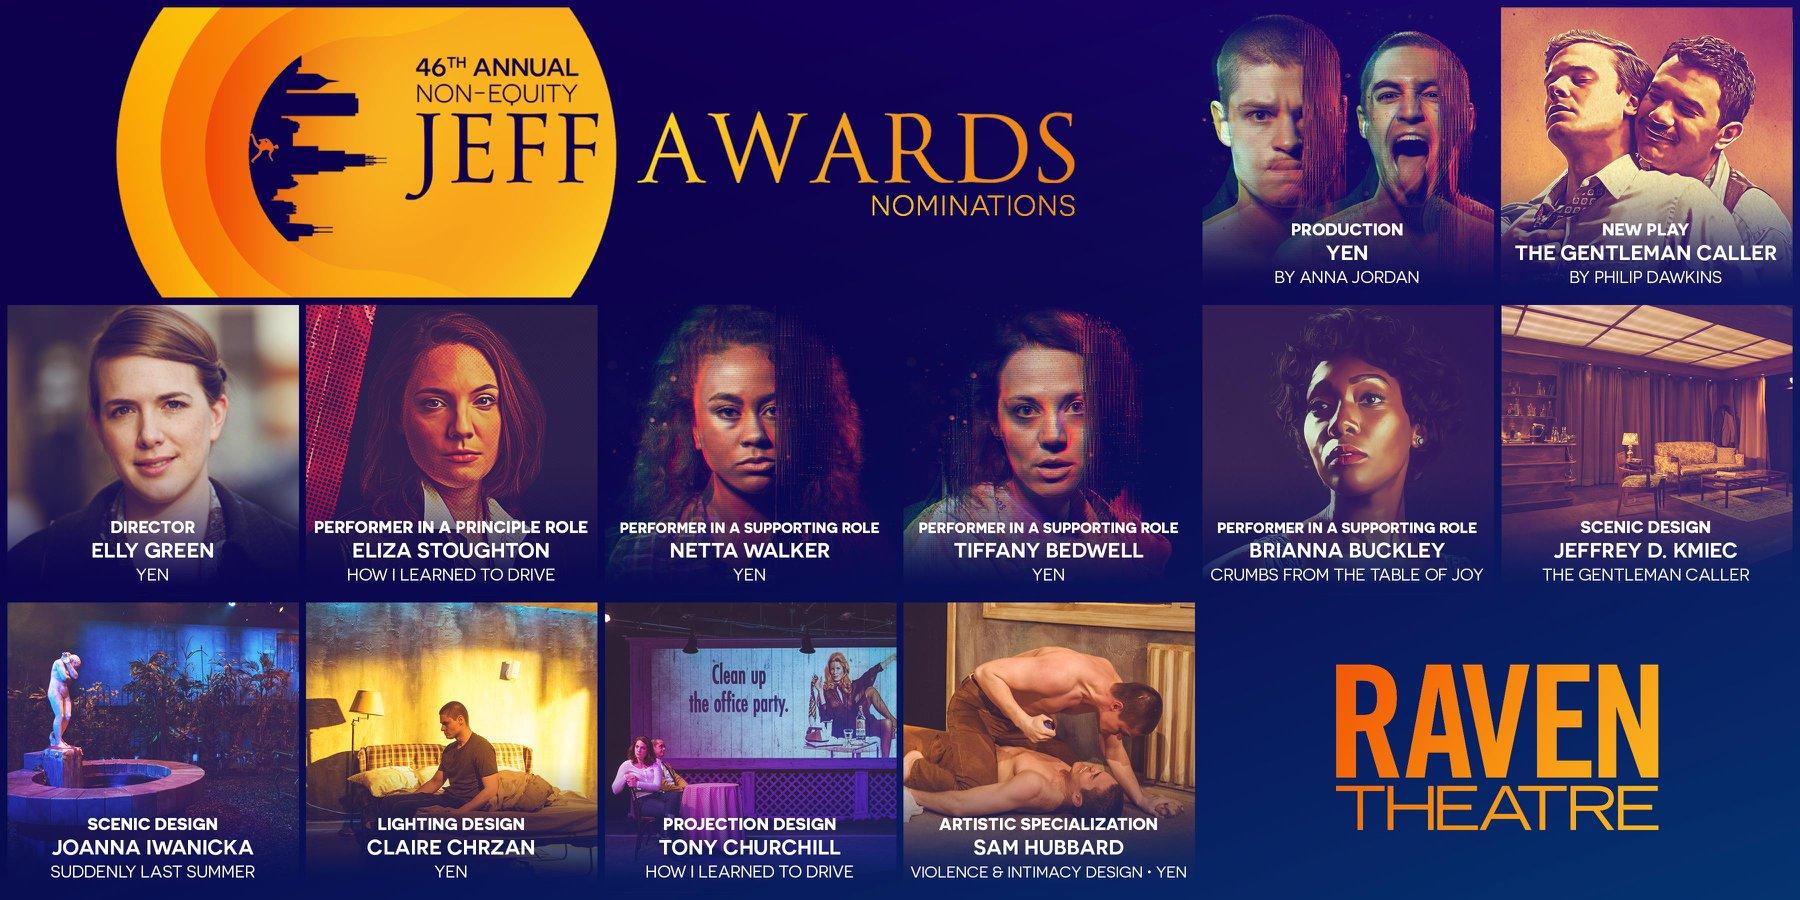 Jeff Awards raven montage YEN